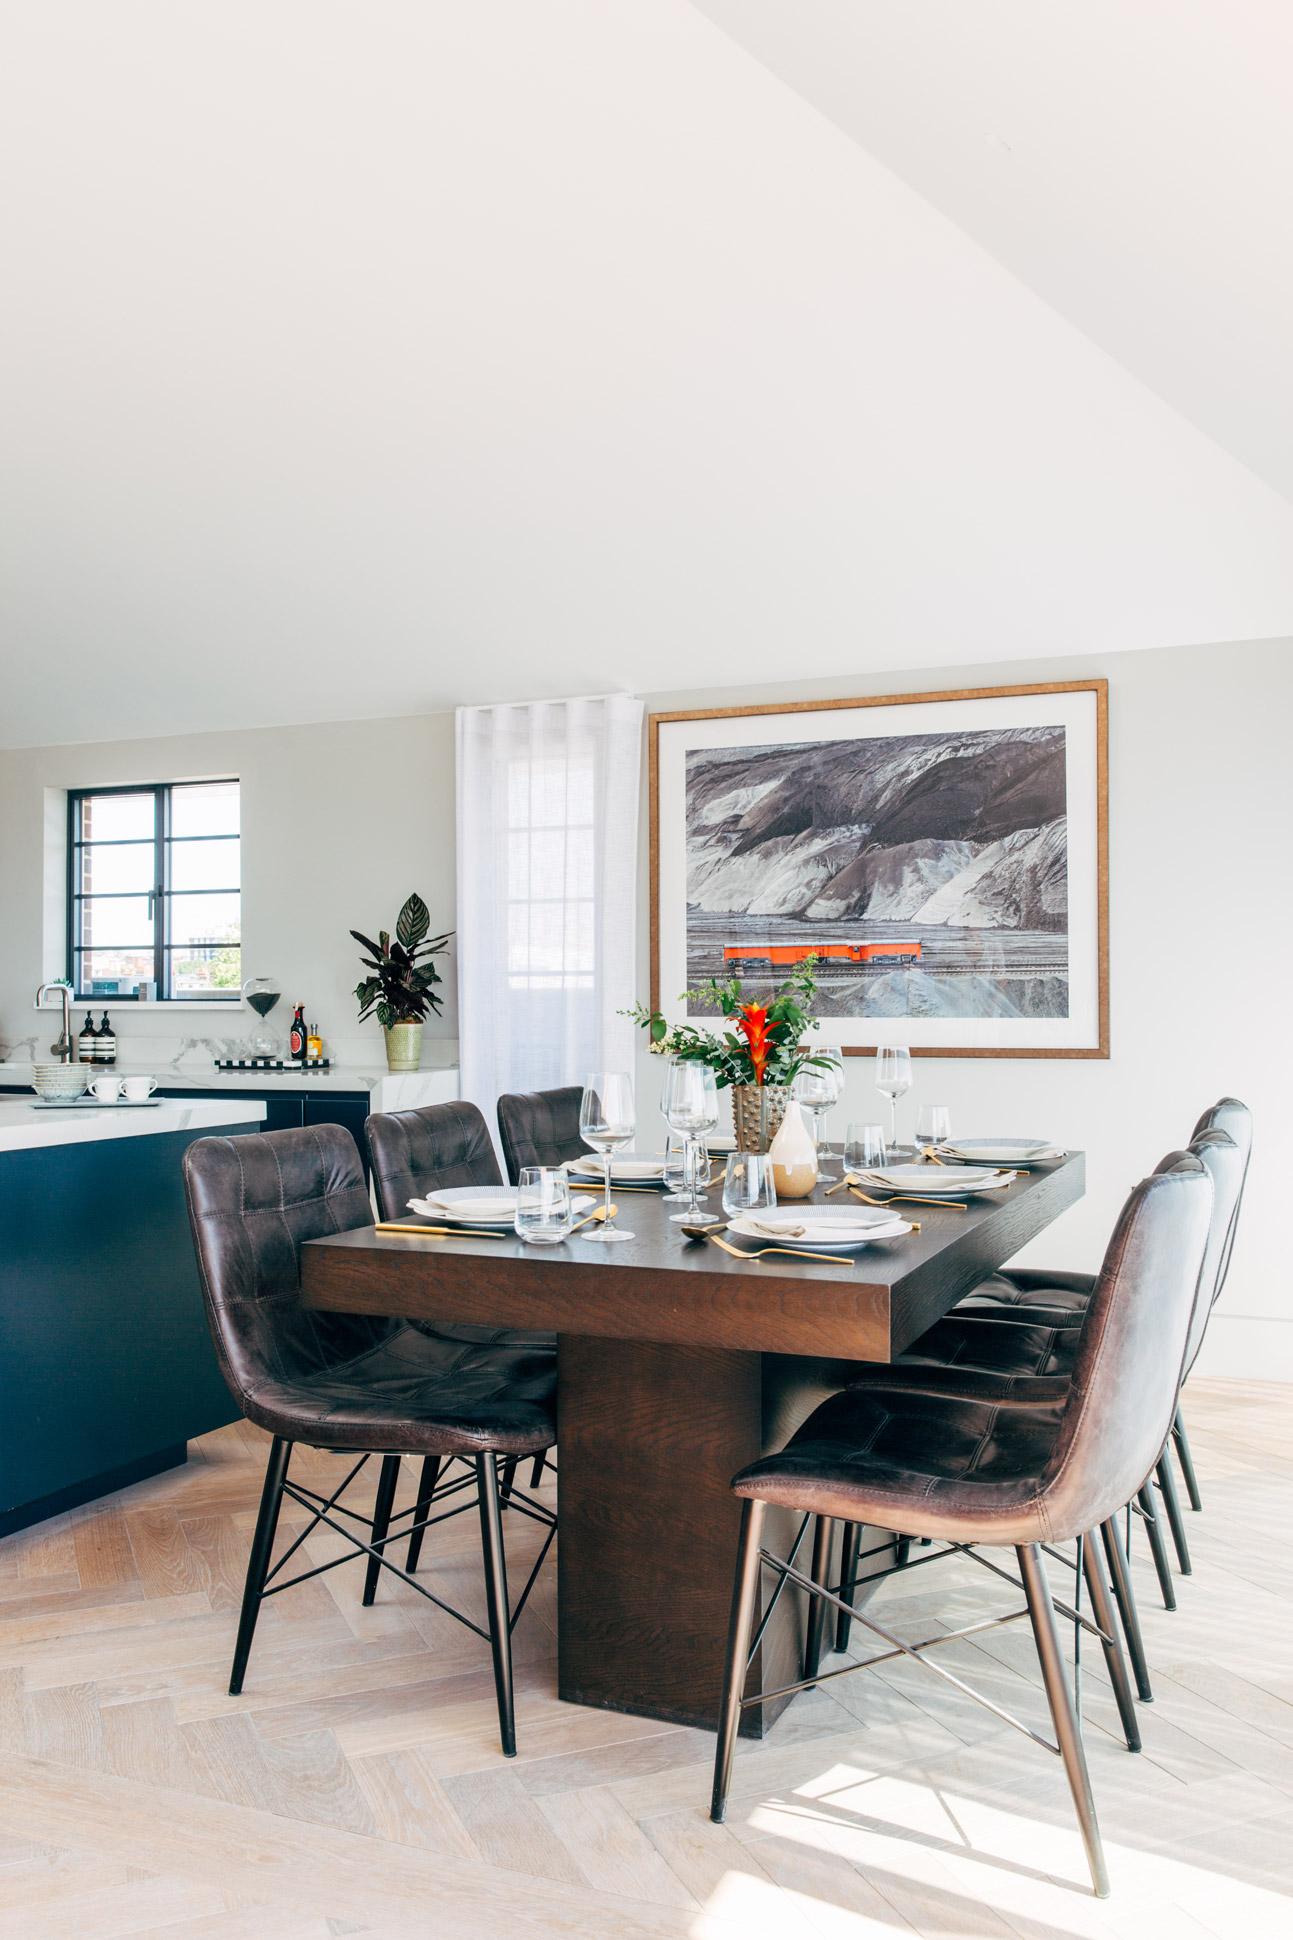 A_LONDON_04_Dining_Room_Kitchen_Living_Room.jpg